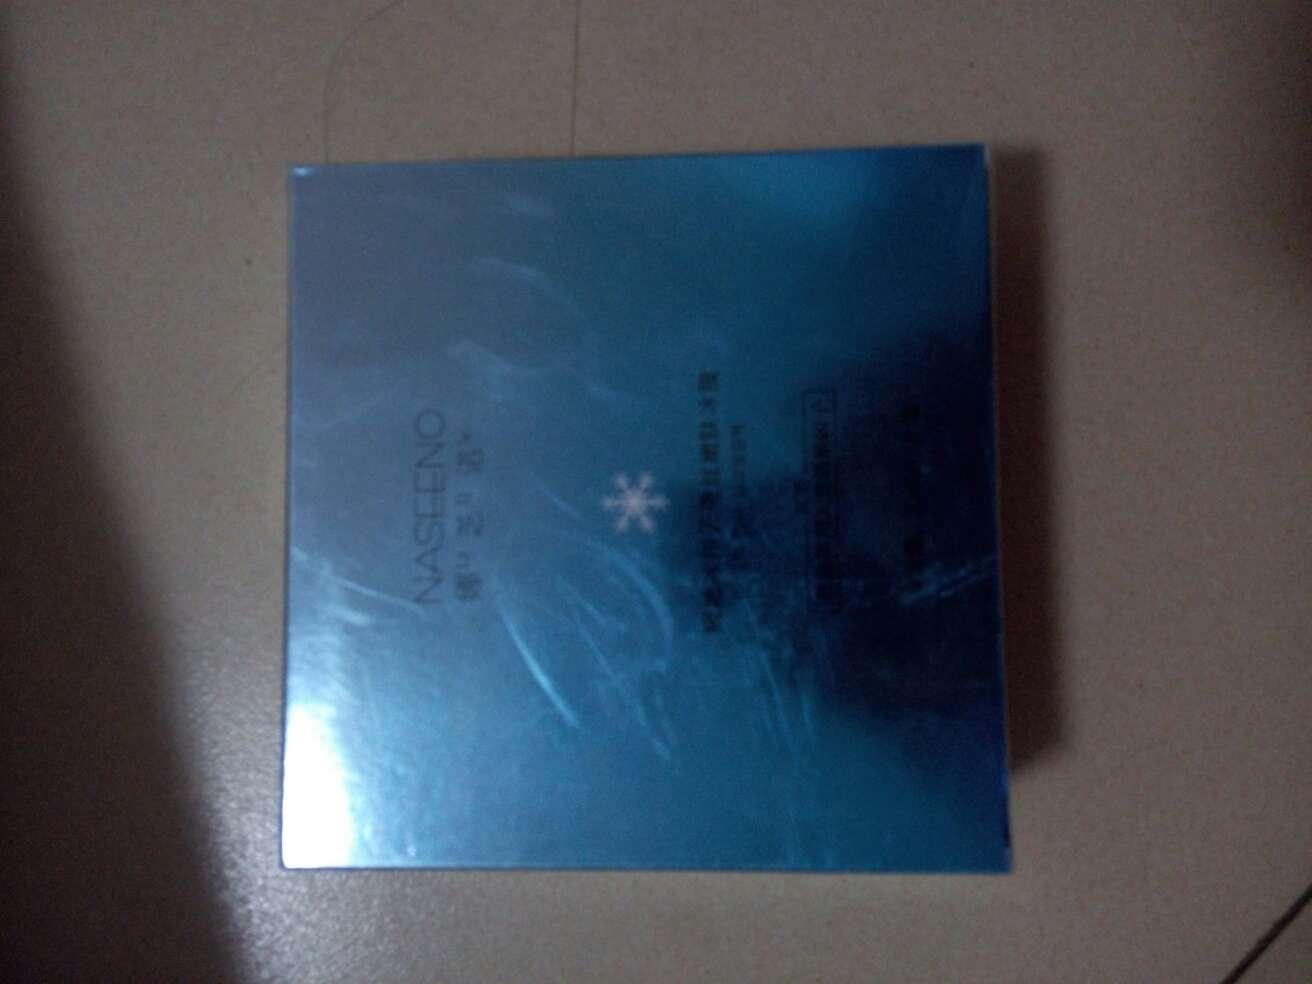 online jewellery 002 balenciaga nike shoes 23193 cheaponsale